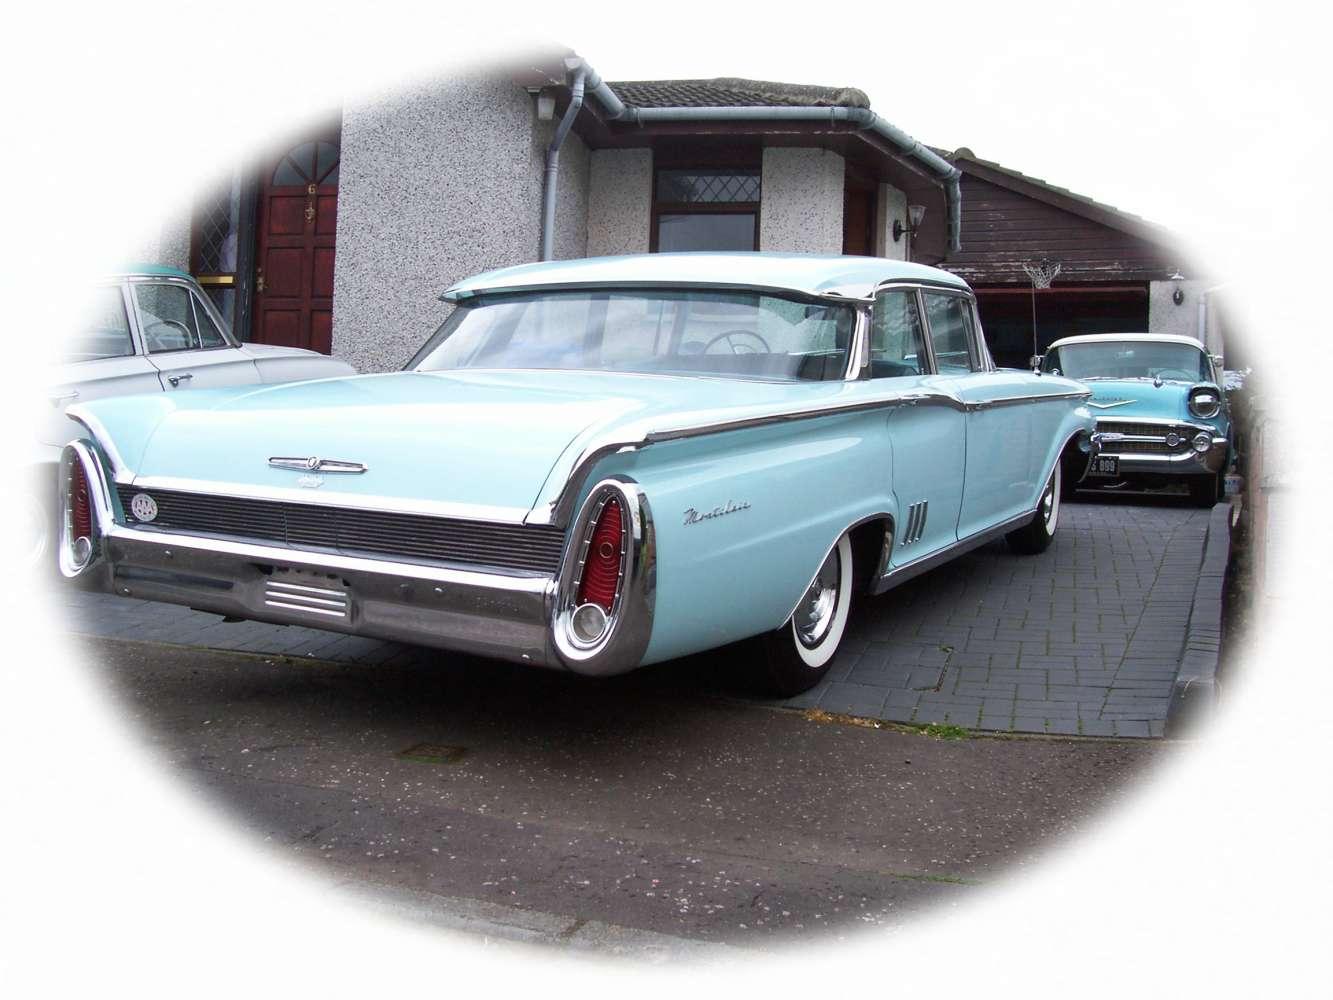 1960 Mercury Montclair sedan